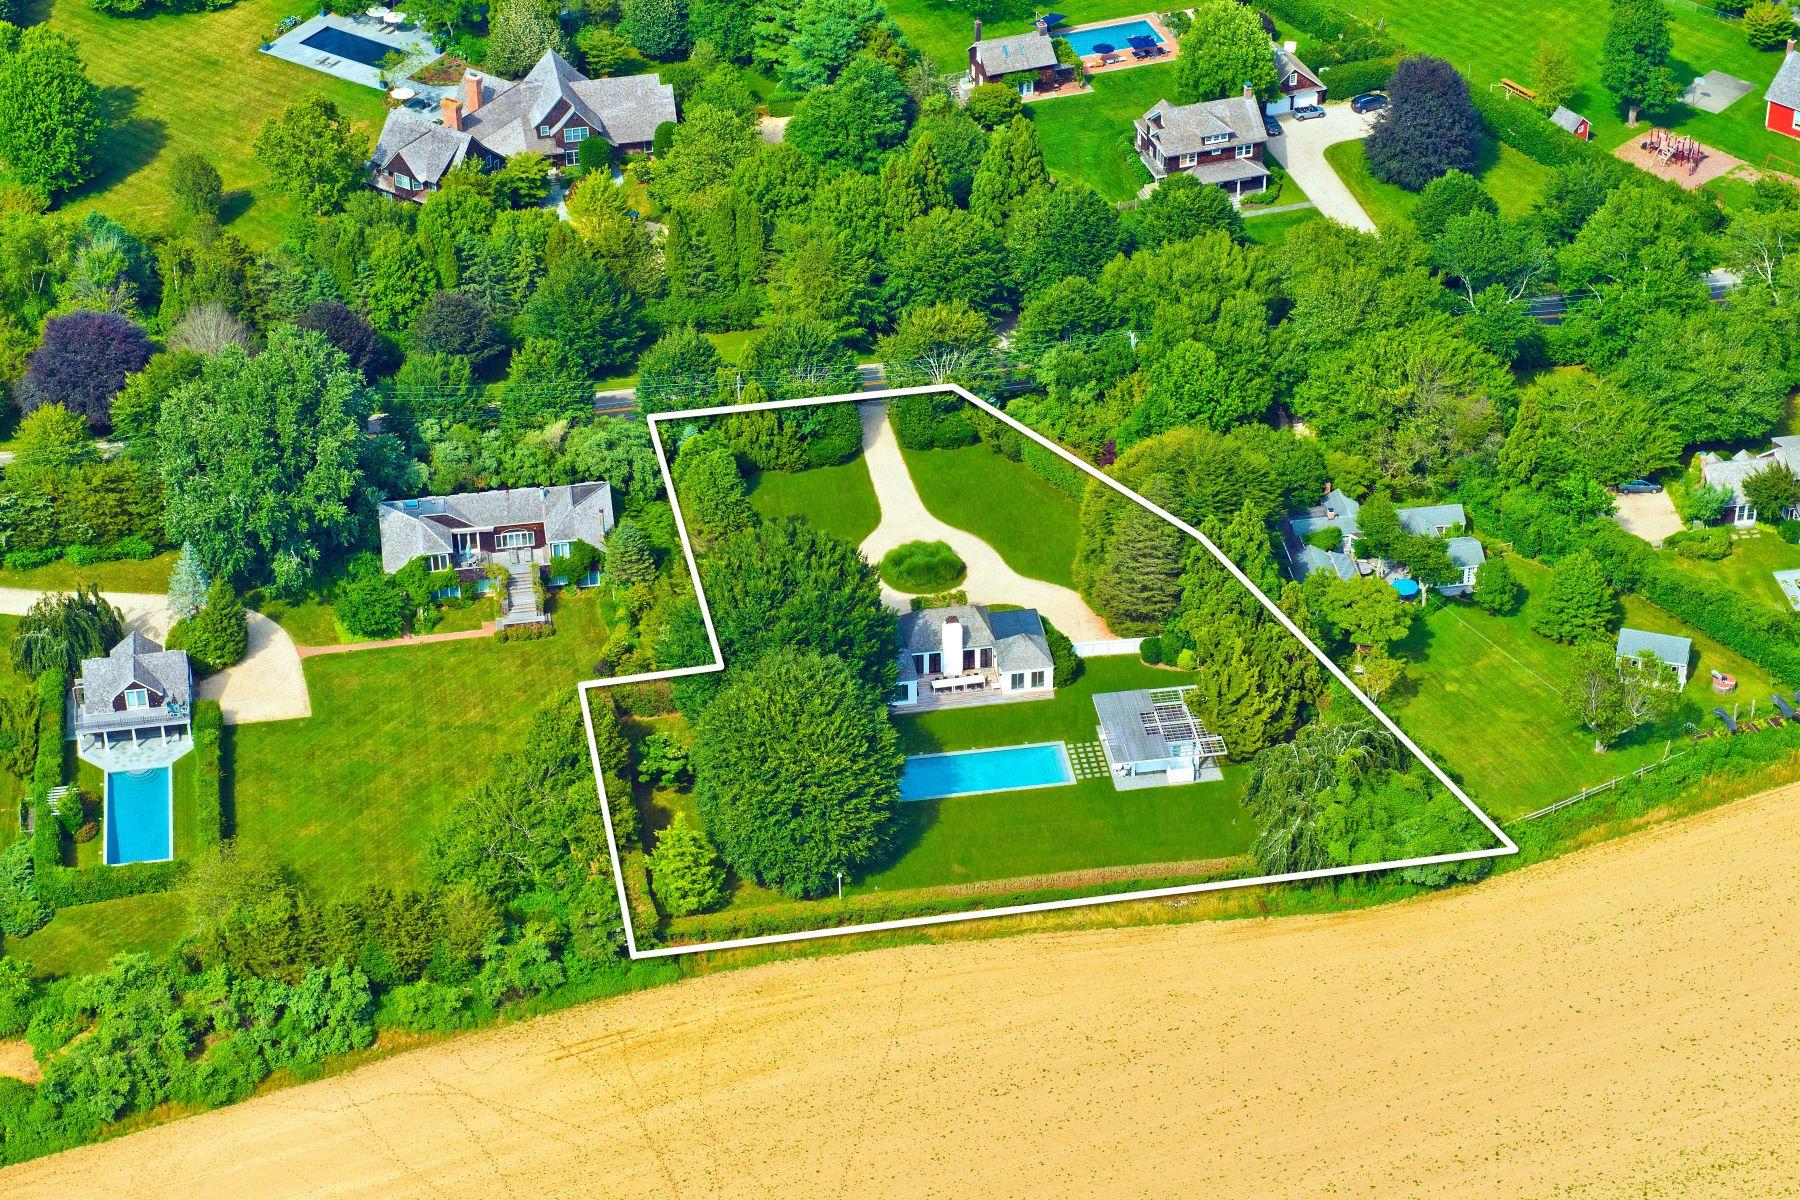 Single Family Homes for Sale at Overlooking Reserve In Sagaponack 627 Sagaponack Road Sagaponack, New York 11962 United States